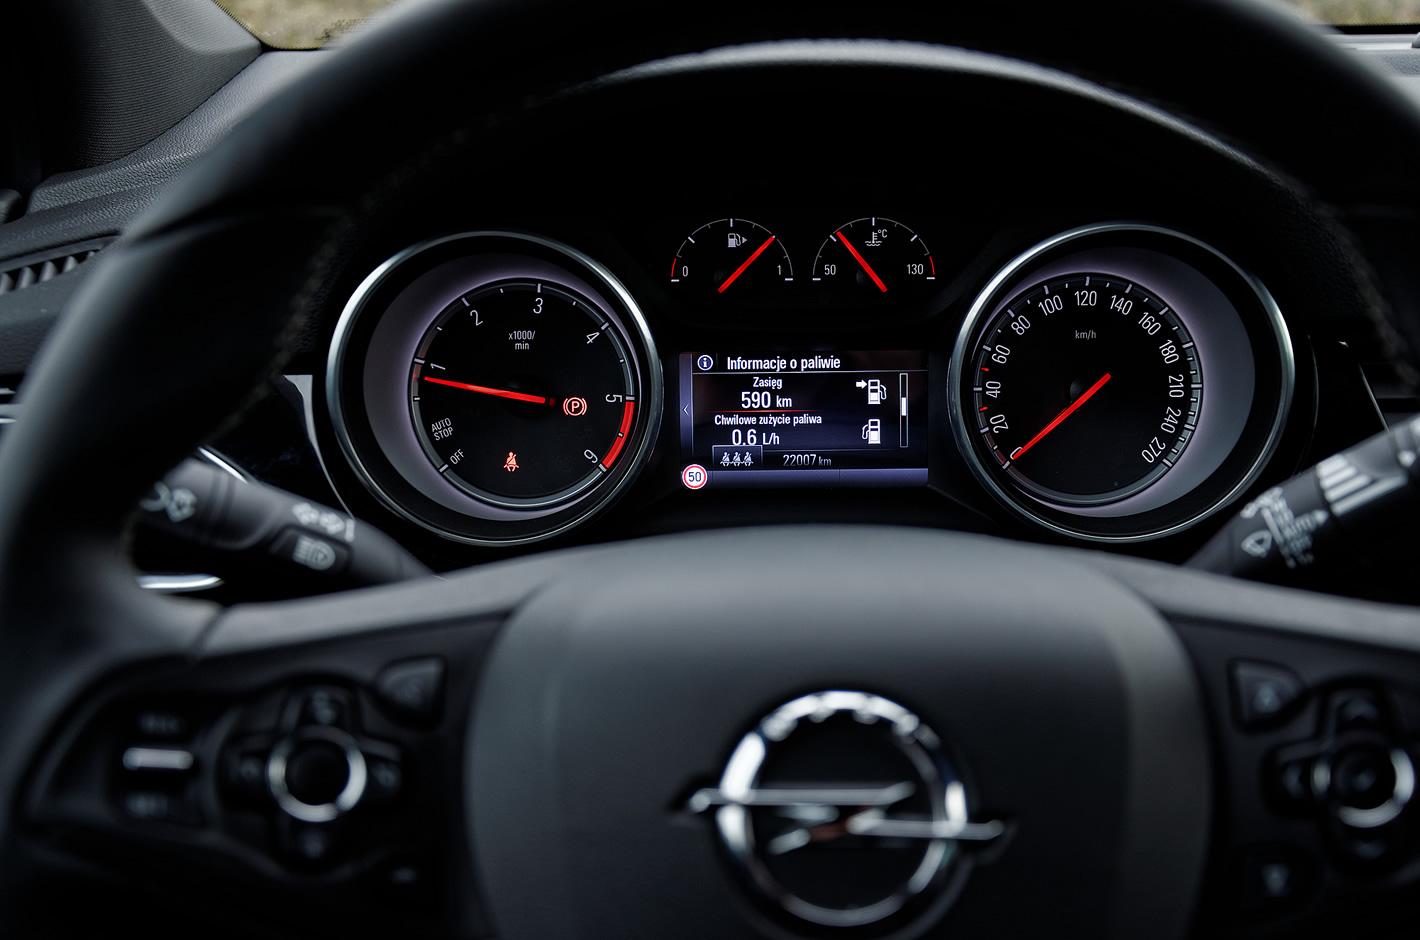 Opel Astra zegary